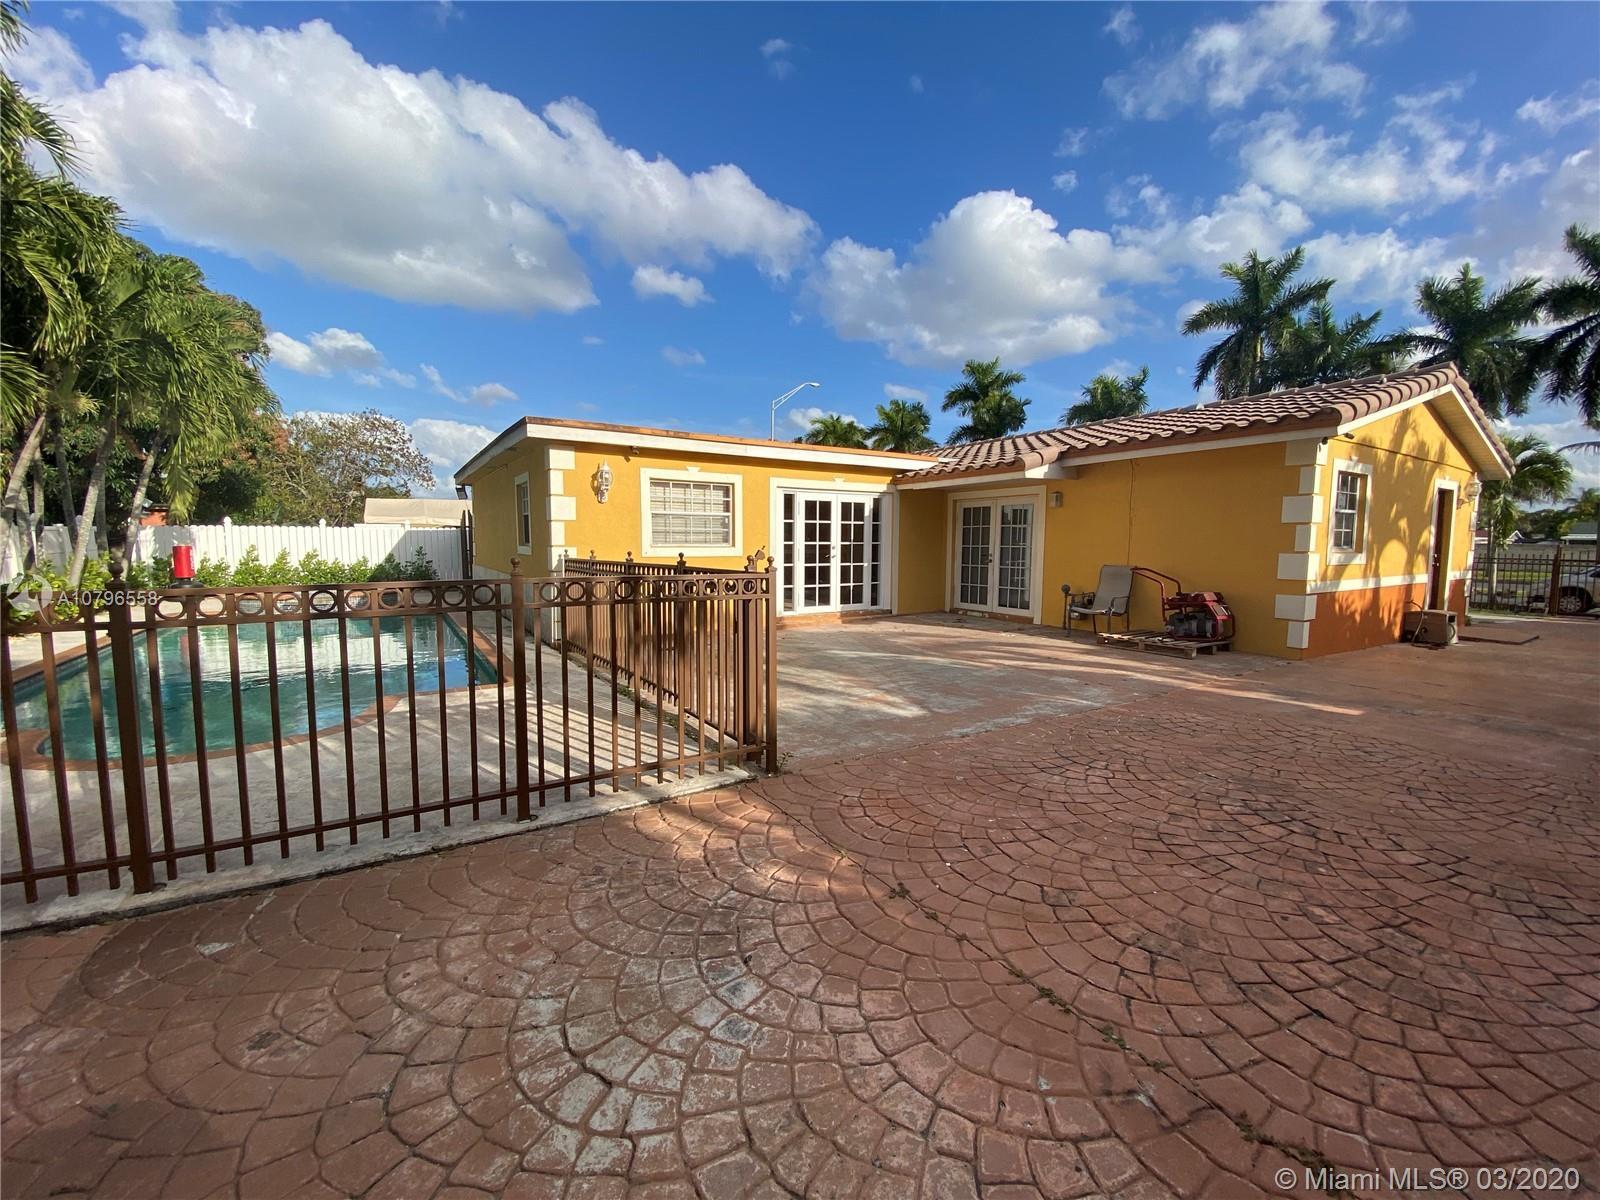 4347 NW 199 Street, Miami Gardens, FL 33055